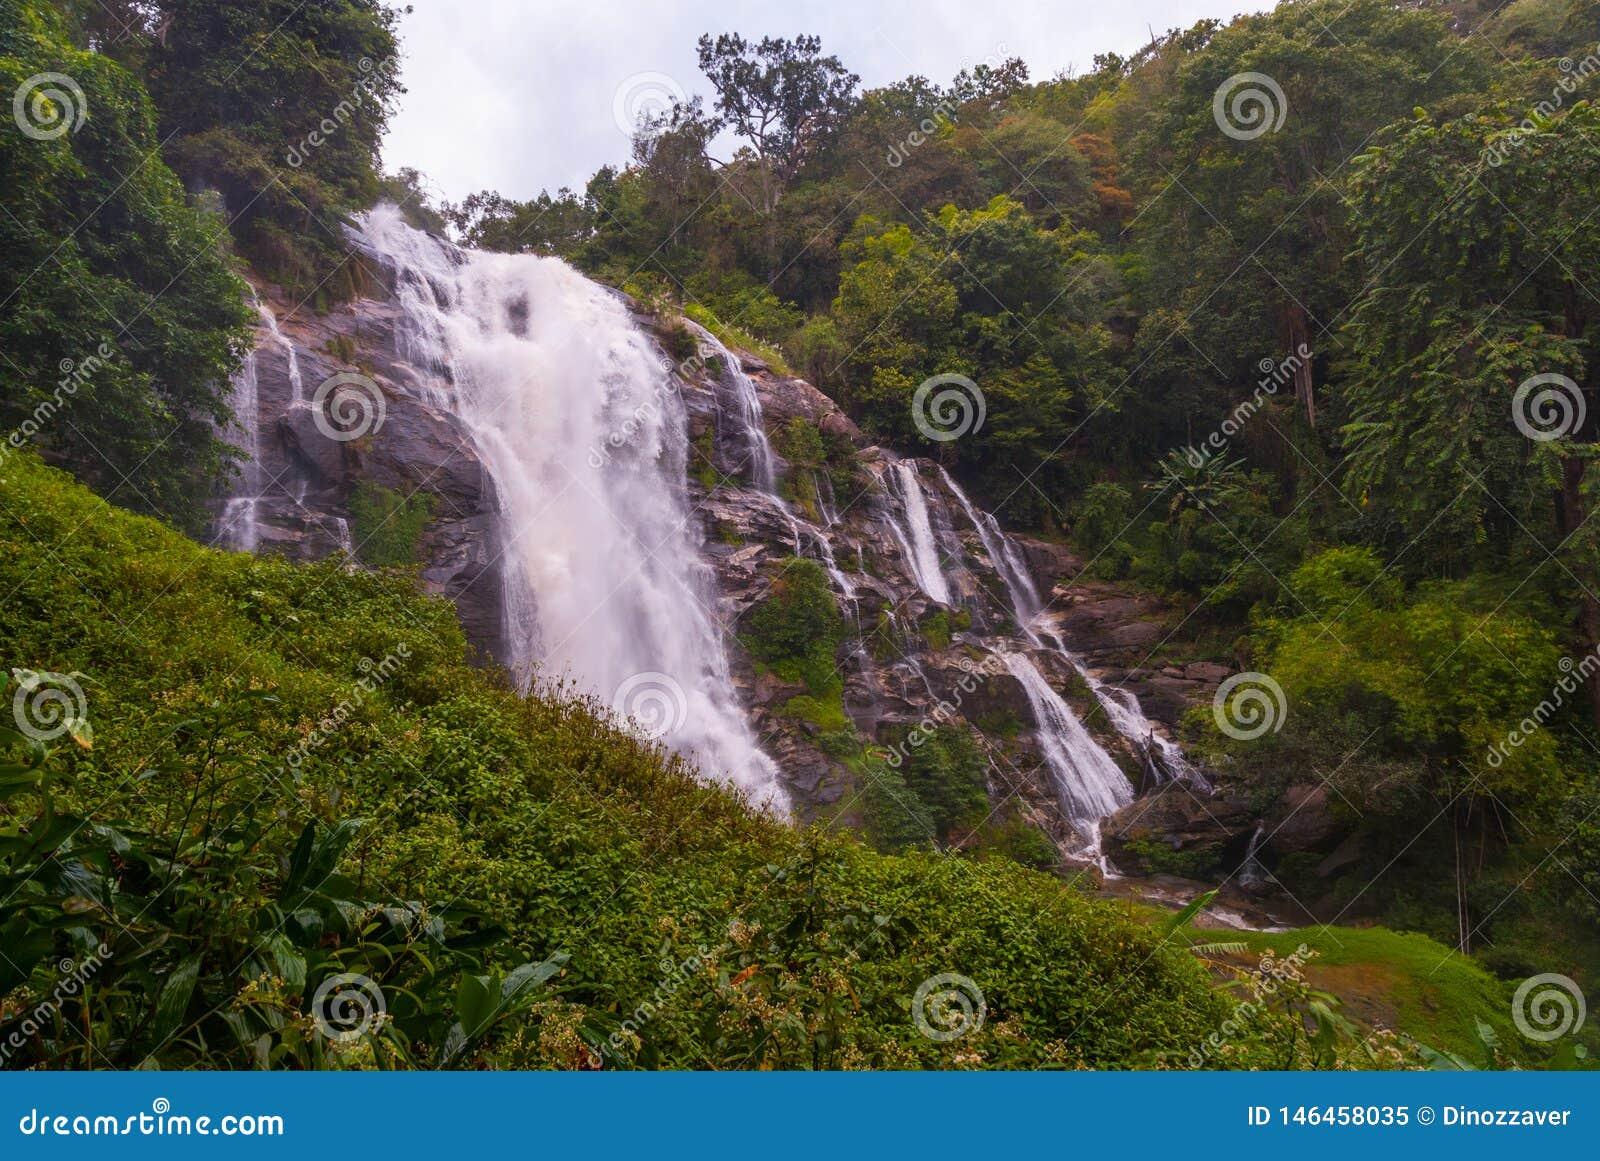 Cachoeira de Wachirathan, Tail?ndia